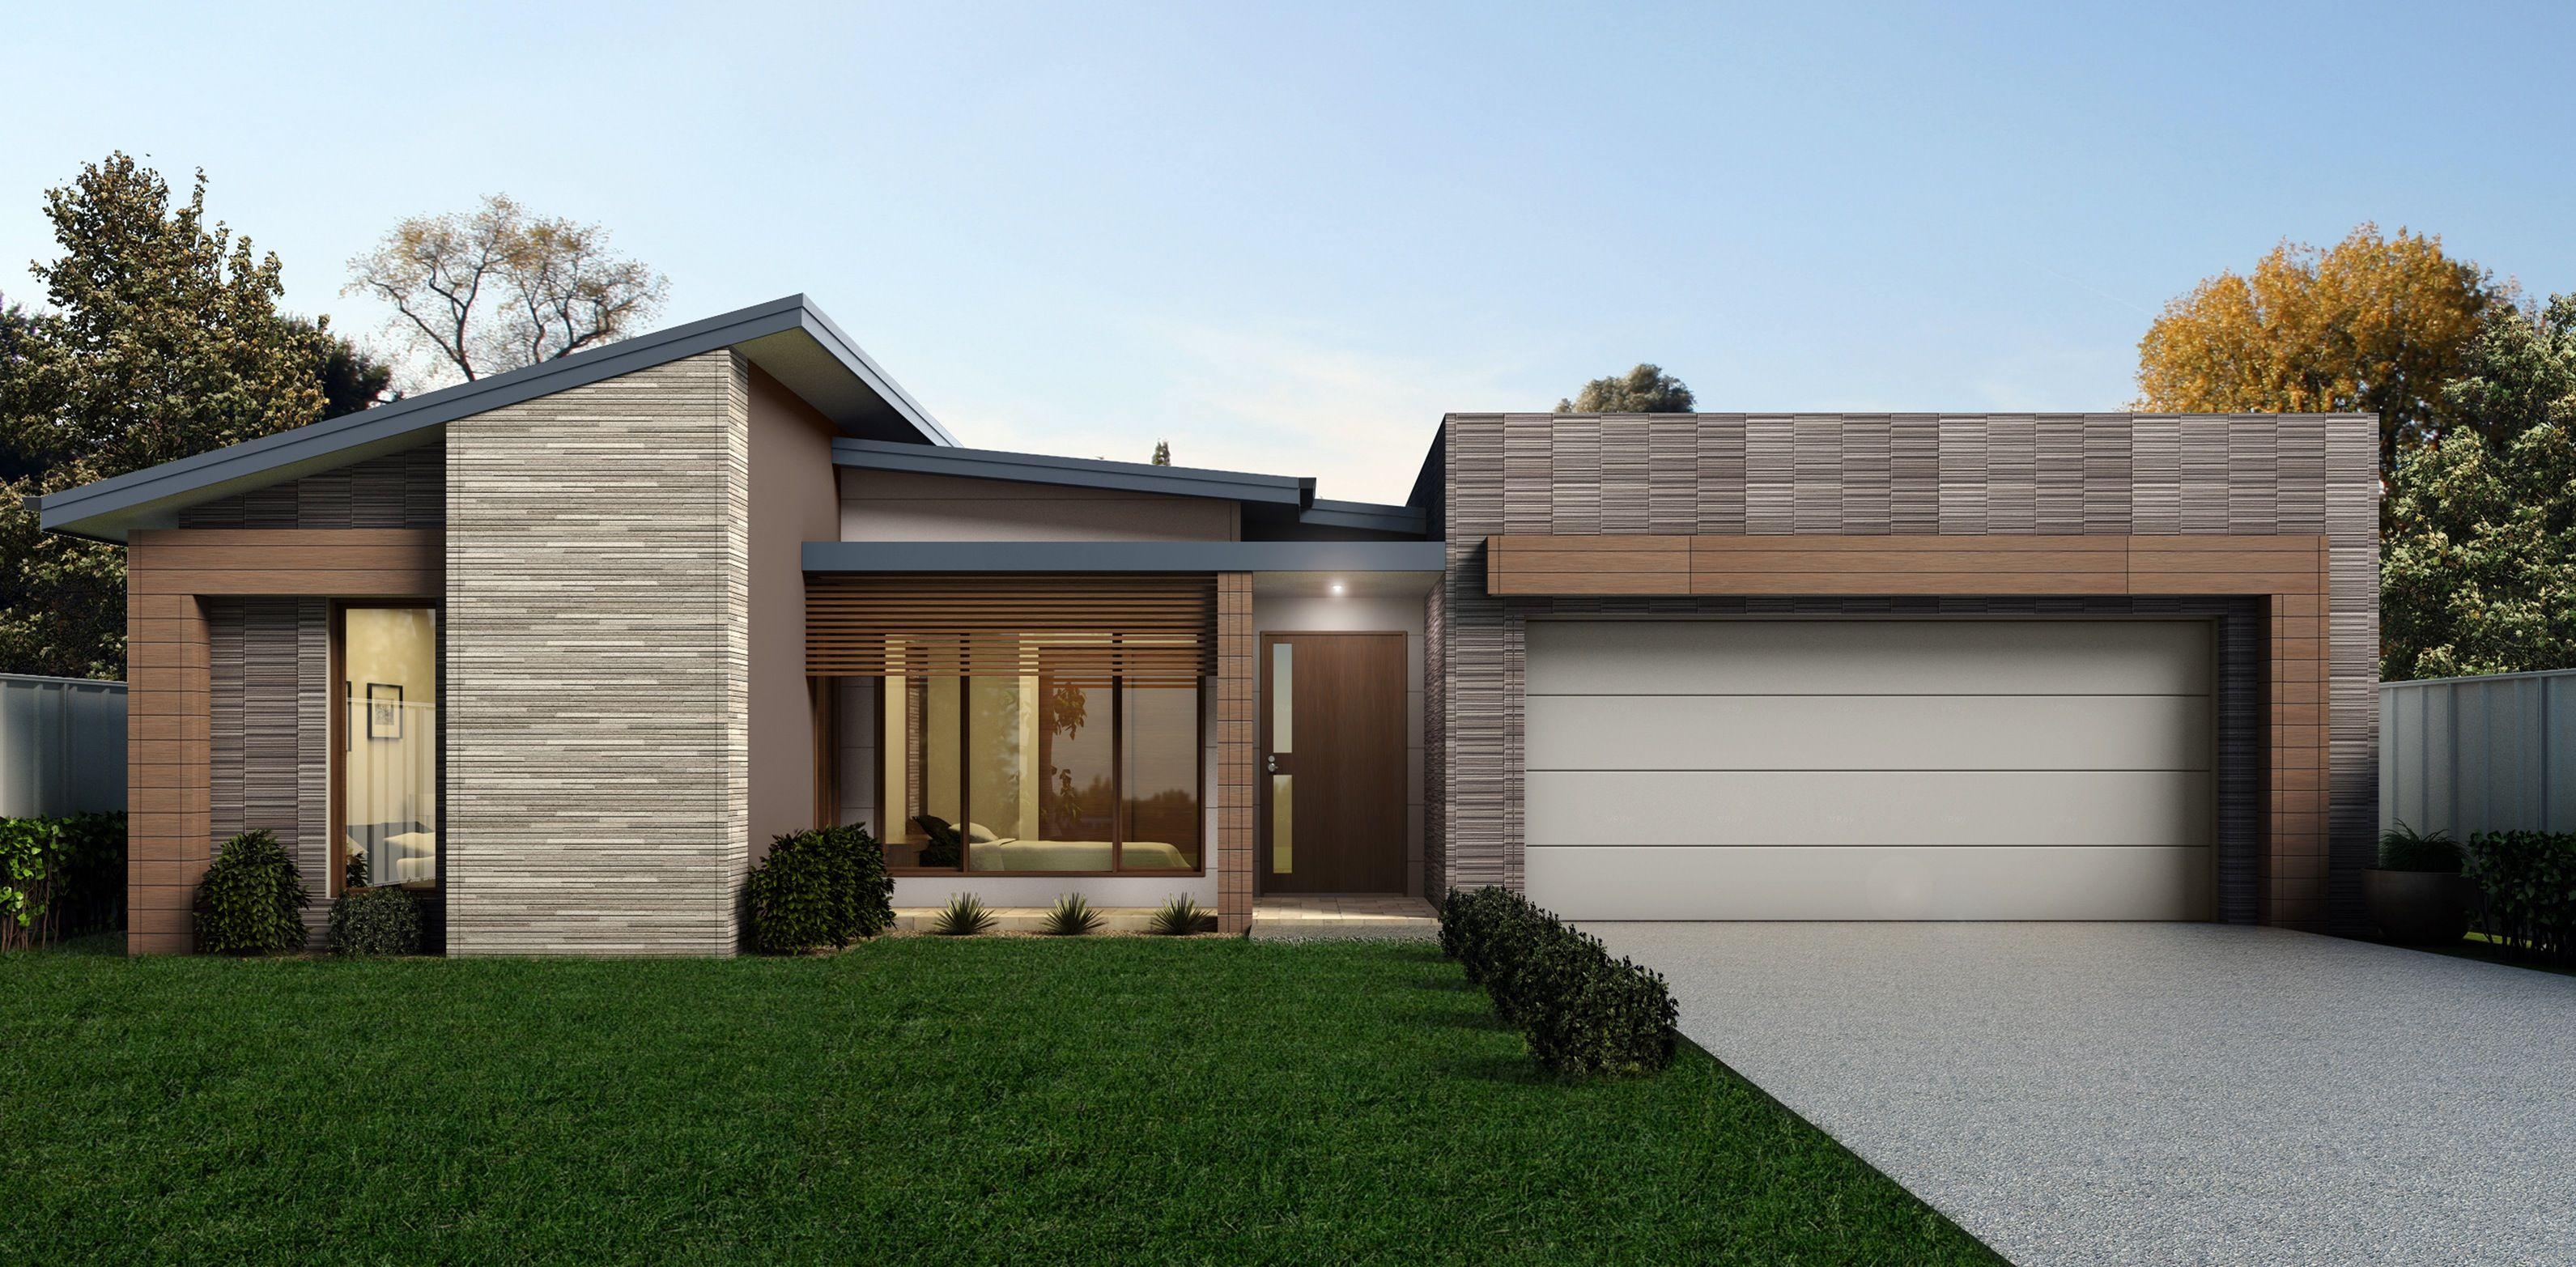 St clair home design energy efficient house plans green